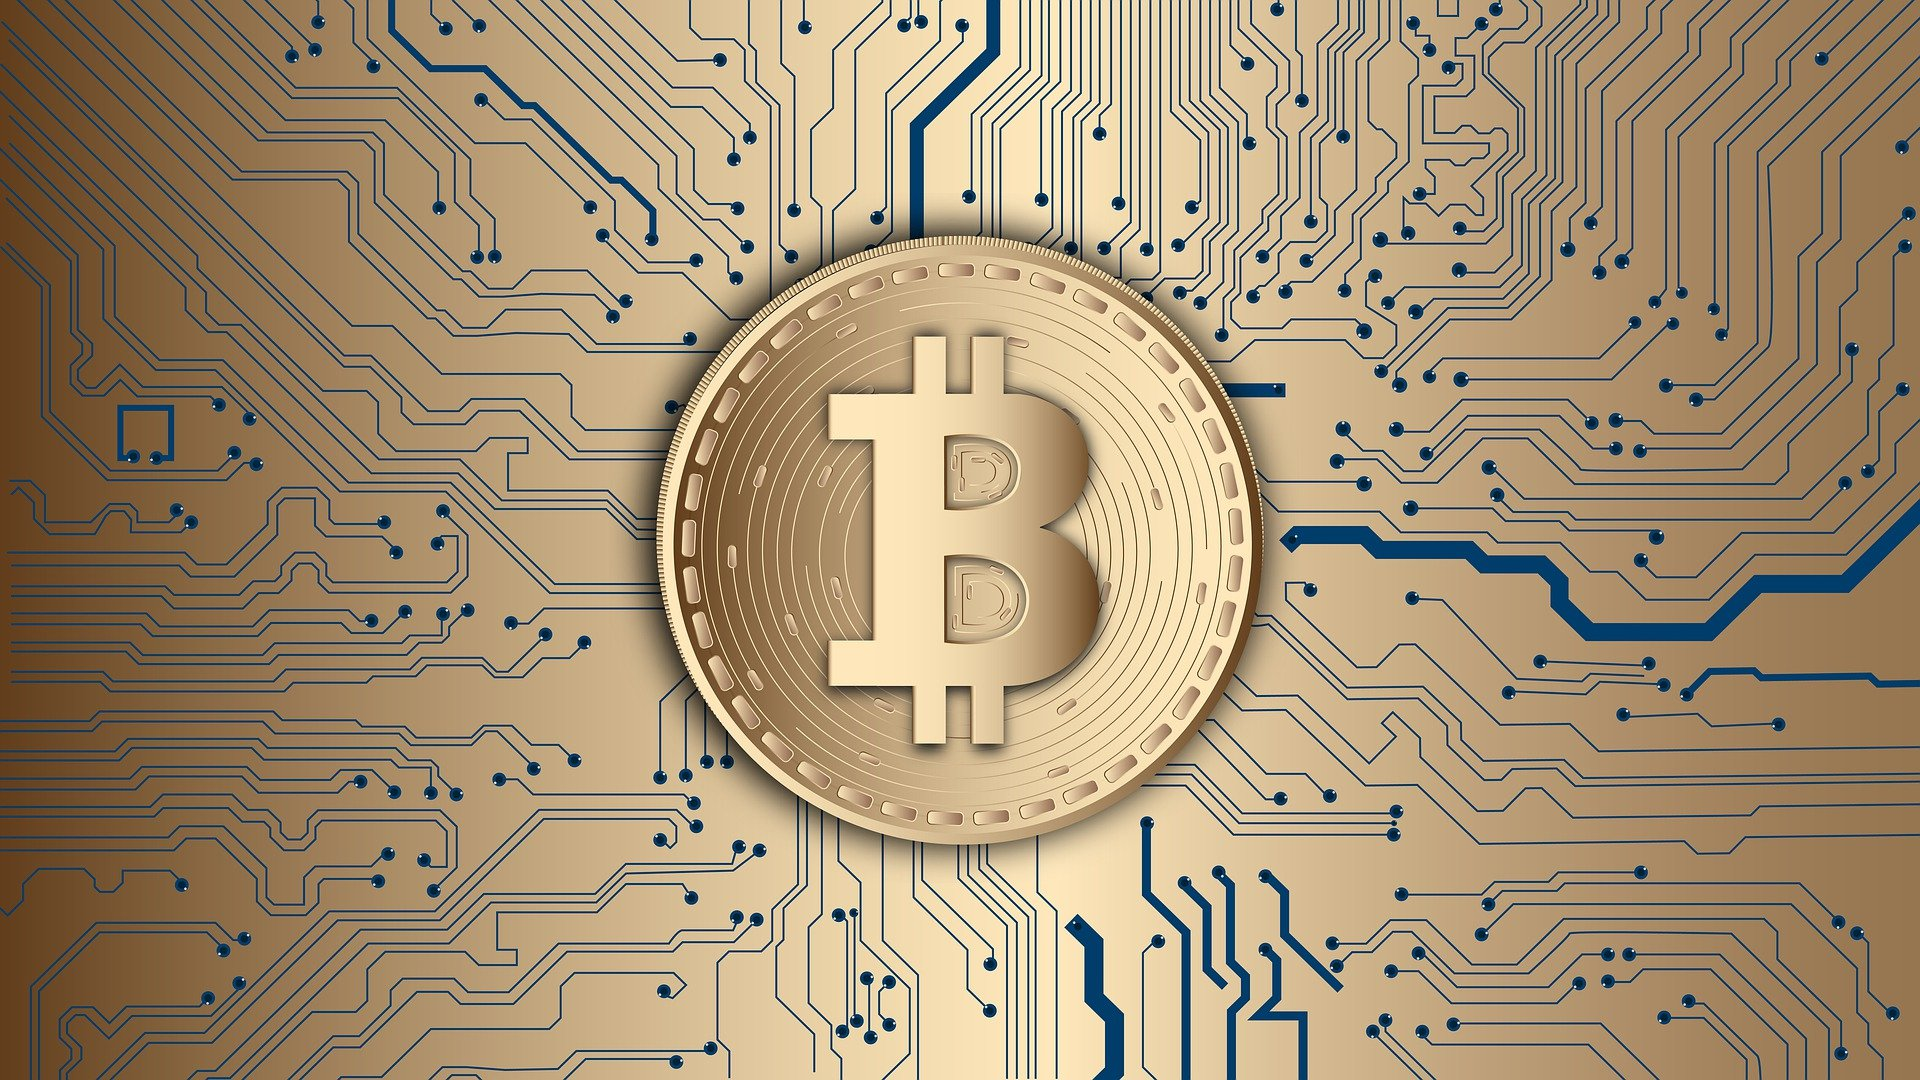 Køb bitcoin, kryptovaluta, køb krypto, køb ethereum, litecoin